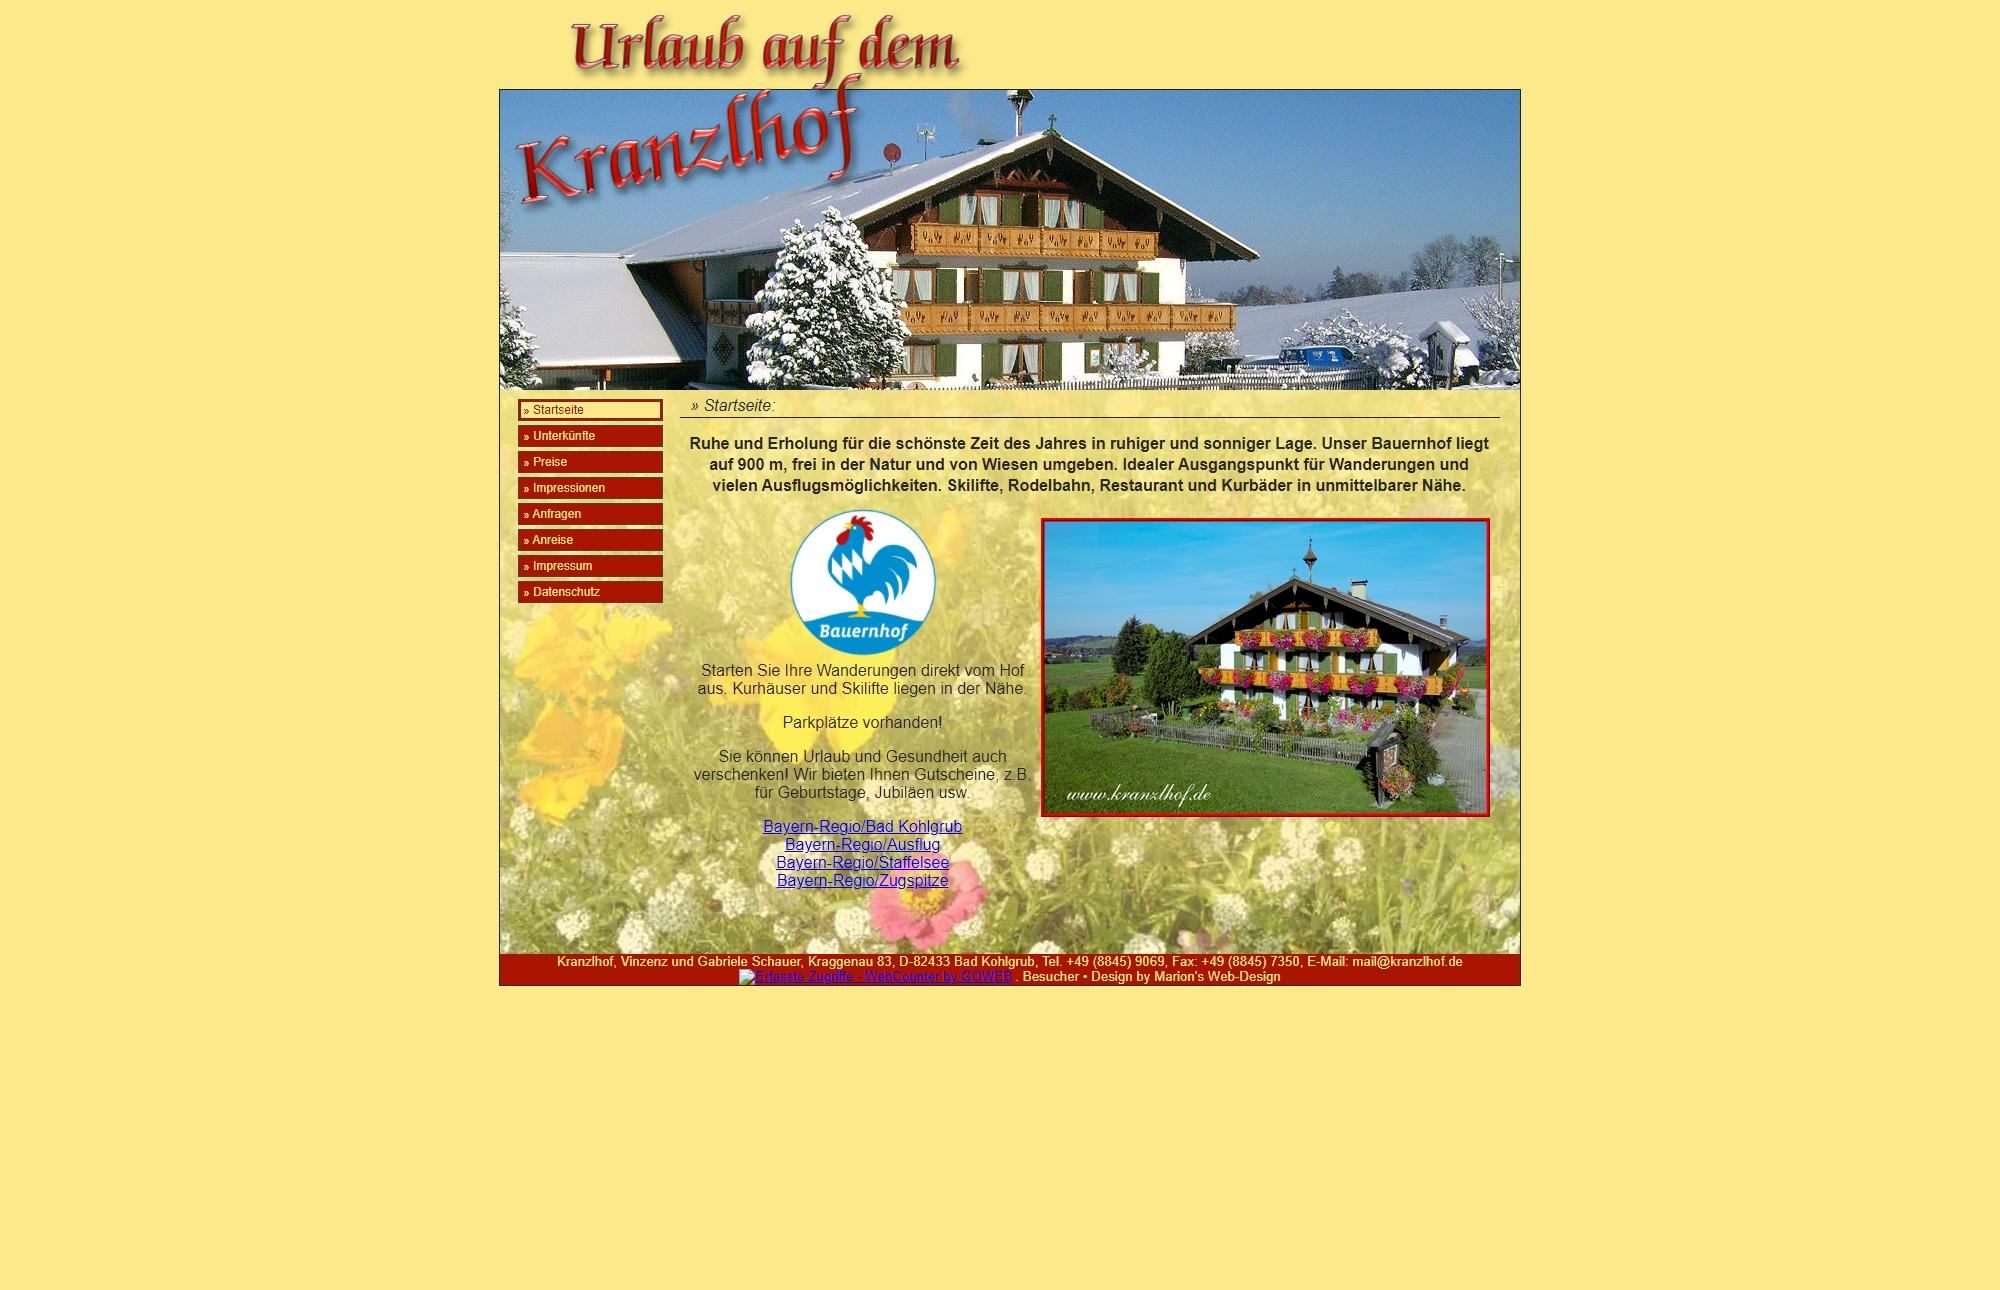 Kranzlhof, Bad Kohlgrub